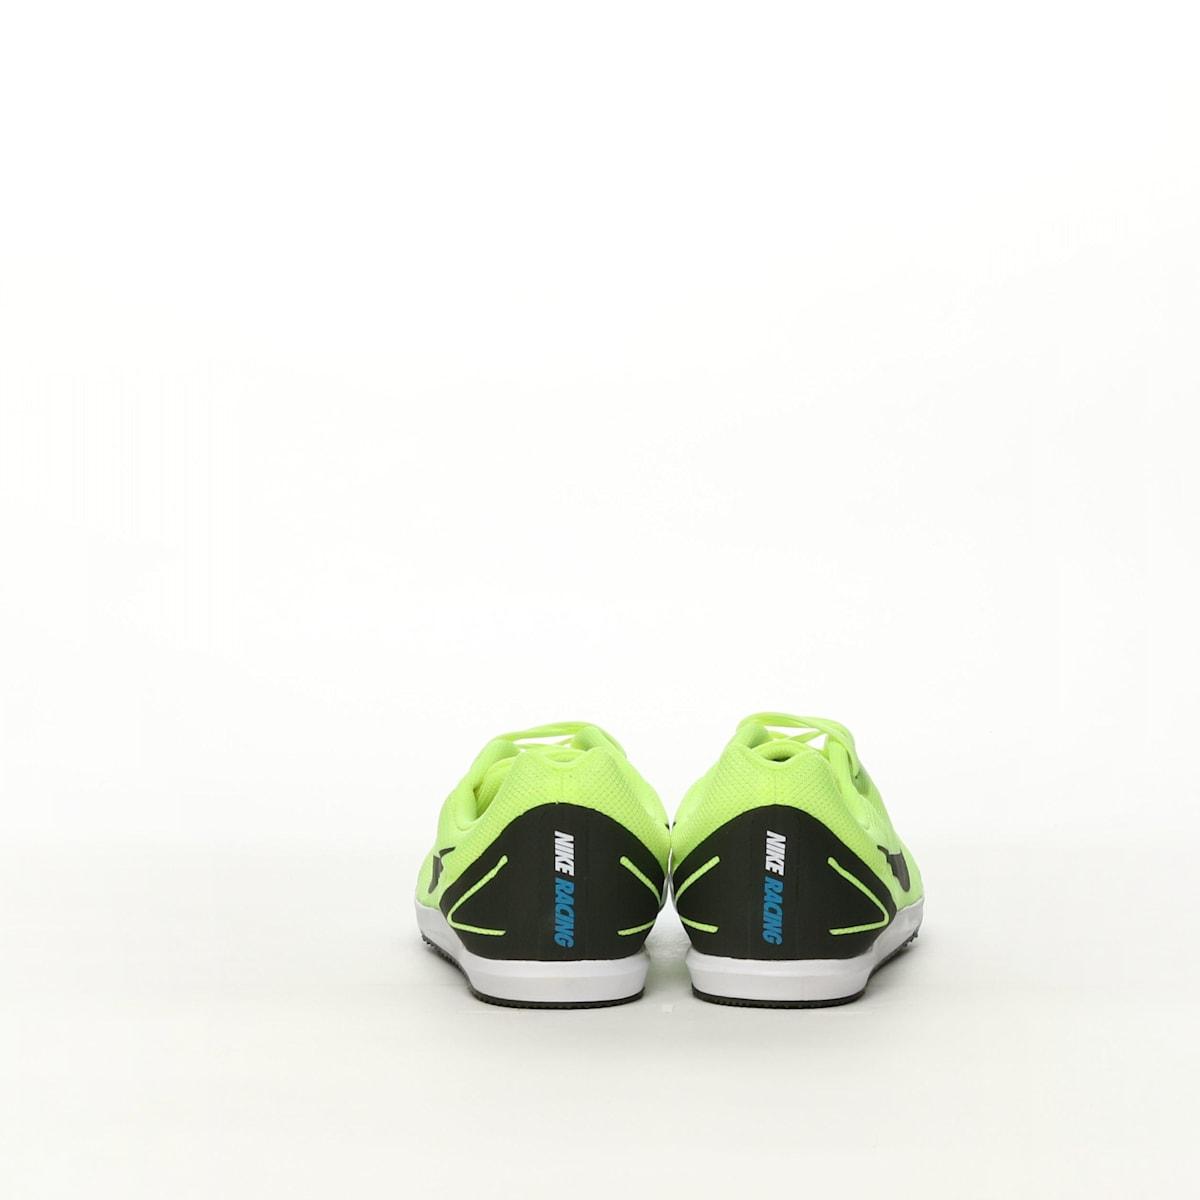 7c79b3a5689 Unisex Nike Zoom Rival D 10 Track Spike - VLTGLW SEQUOI – Resku